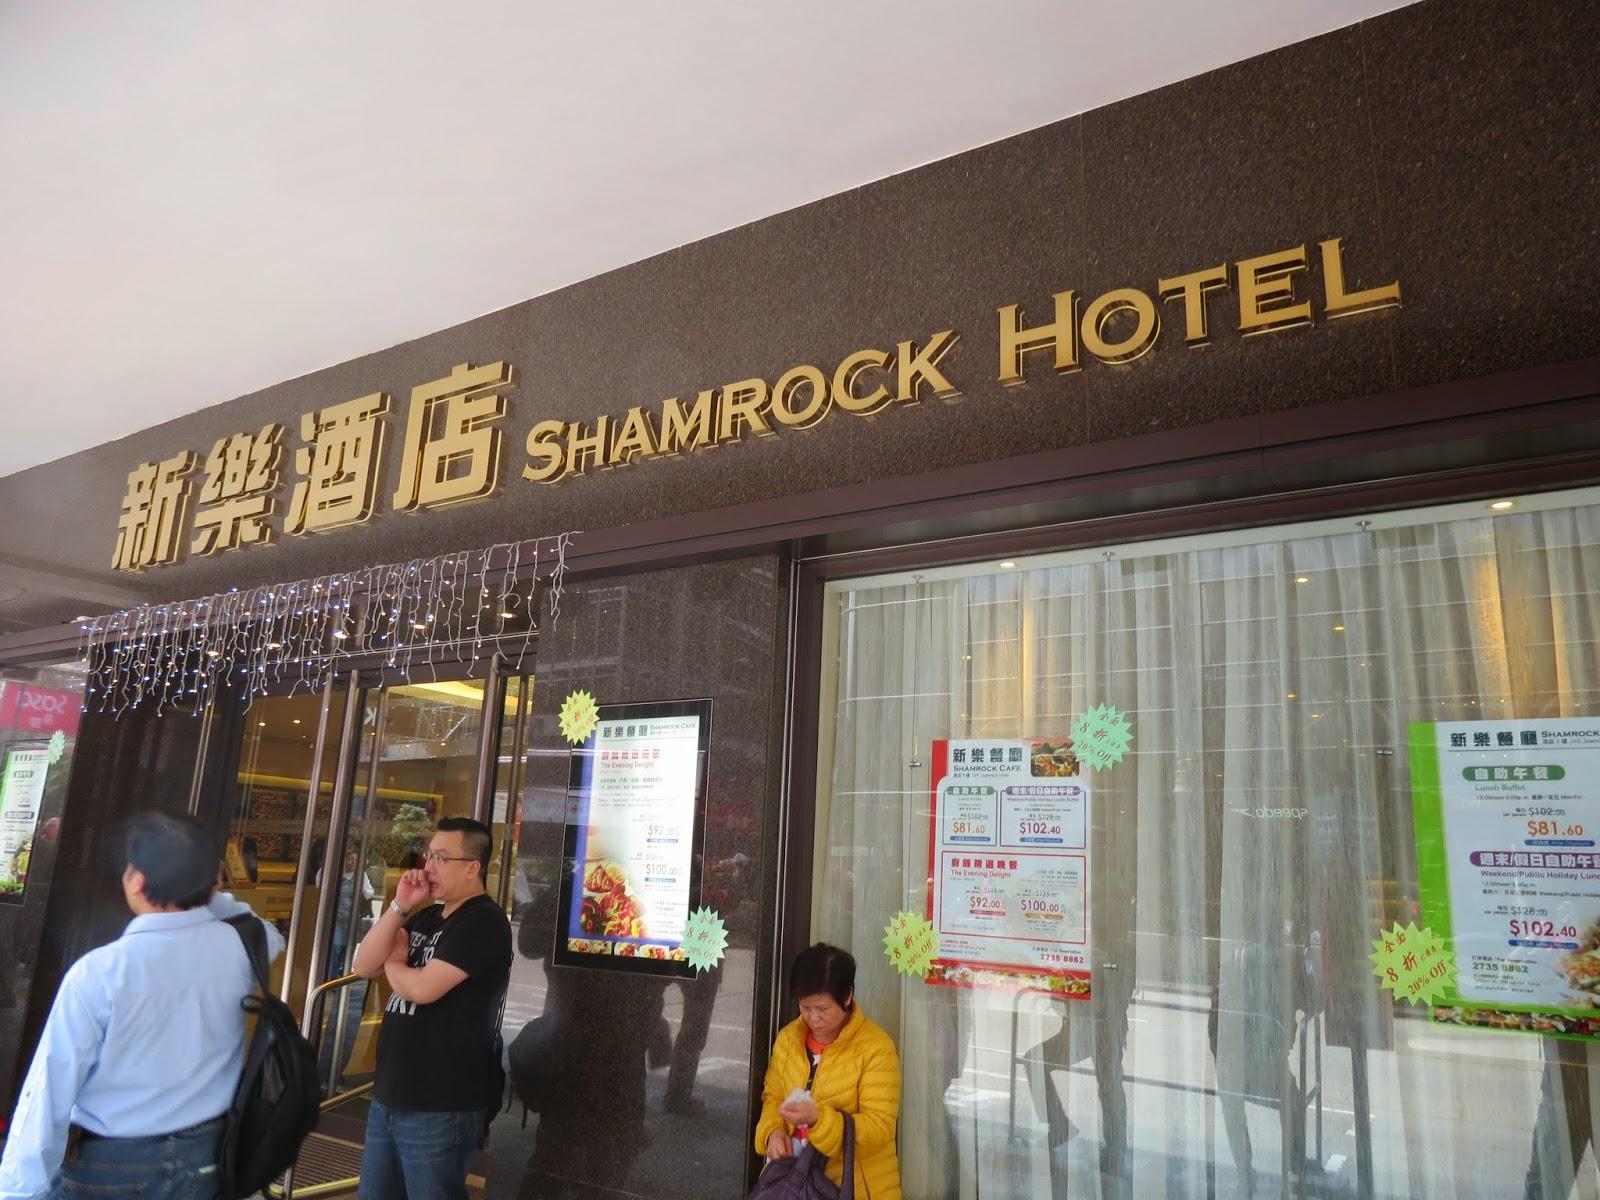 Shamrock hotel hong kong pictures Book Shamrock Hotel in Hong Kong - 2018 Promos - Agoda